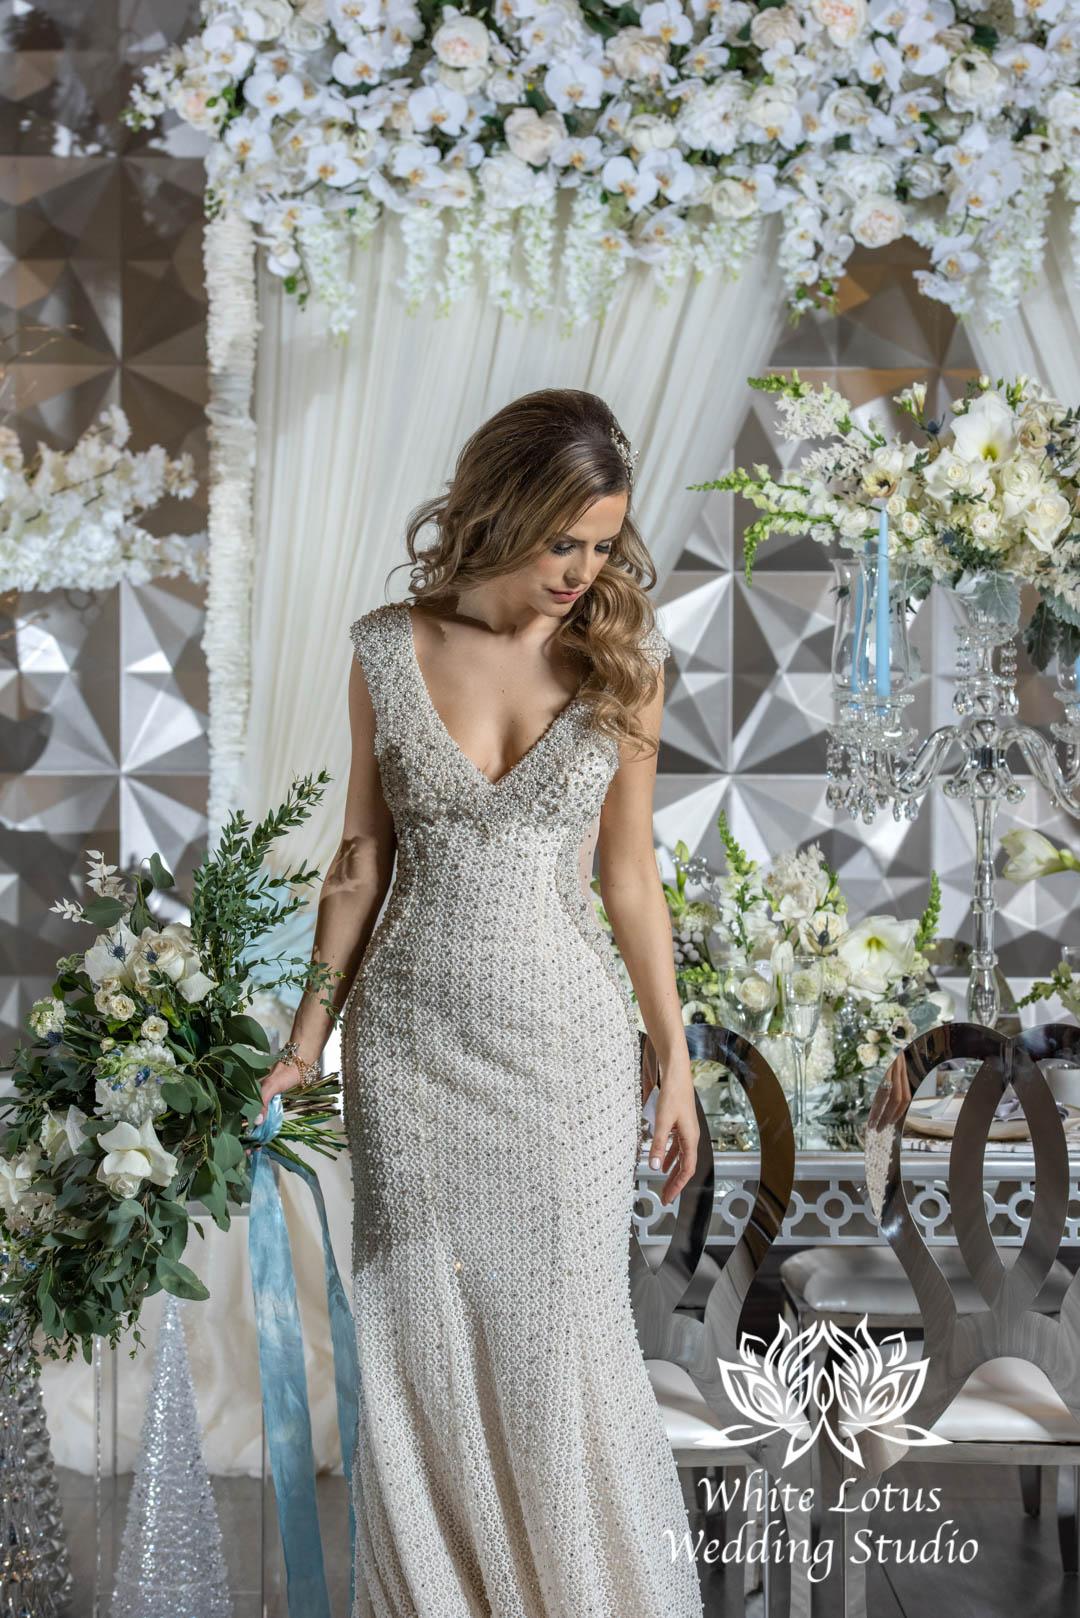 154- GLAM WINTERLUXE WEDDING INSPIRATION